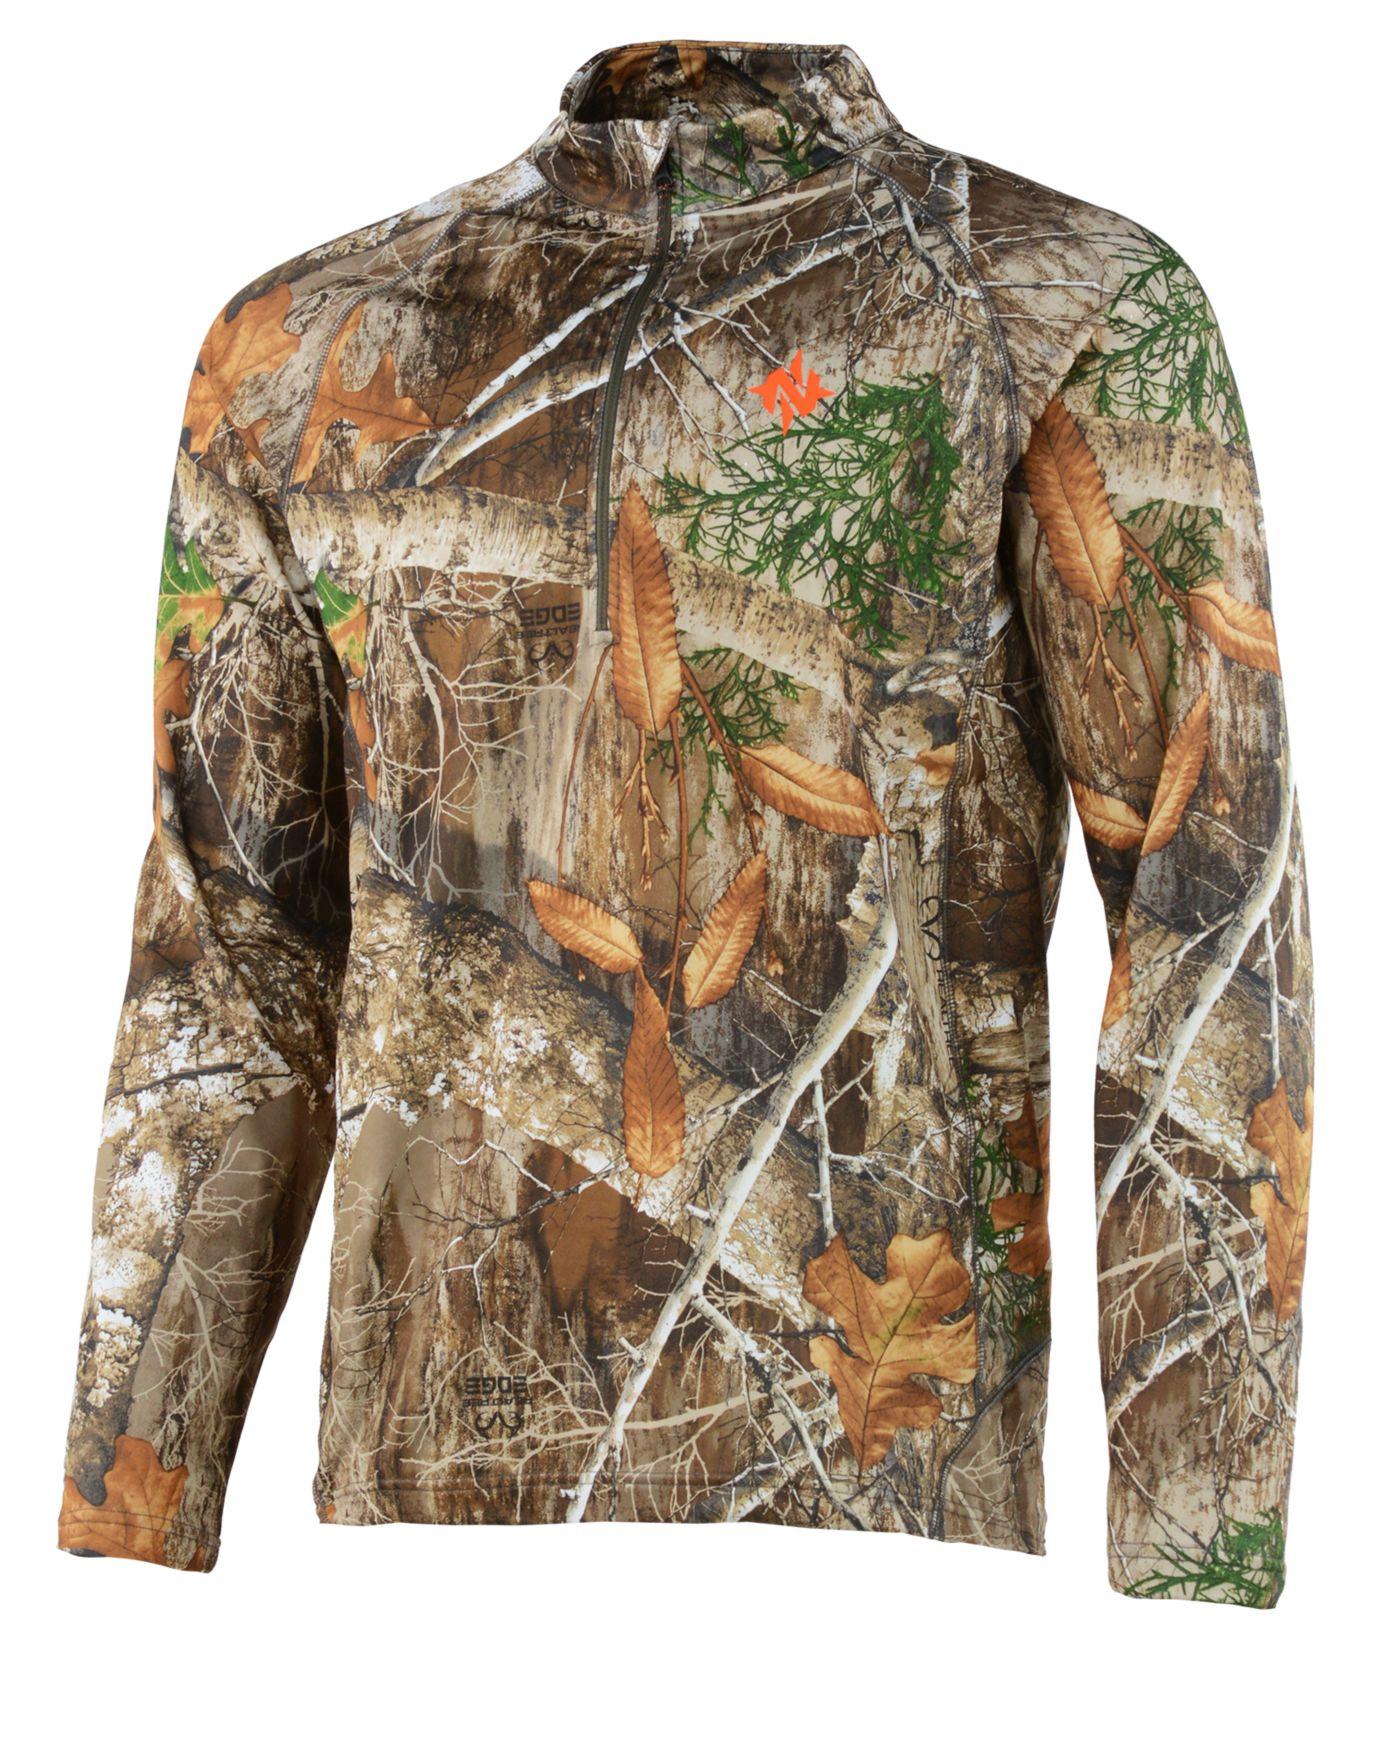 NOMAD Men's Transition 1/4 Zip Hunting Shirt